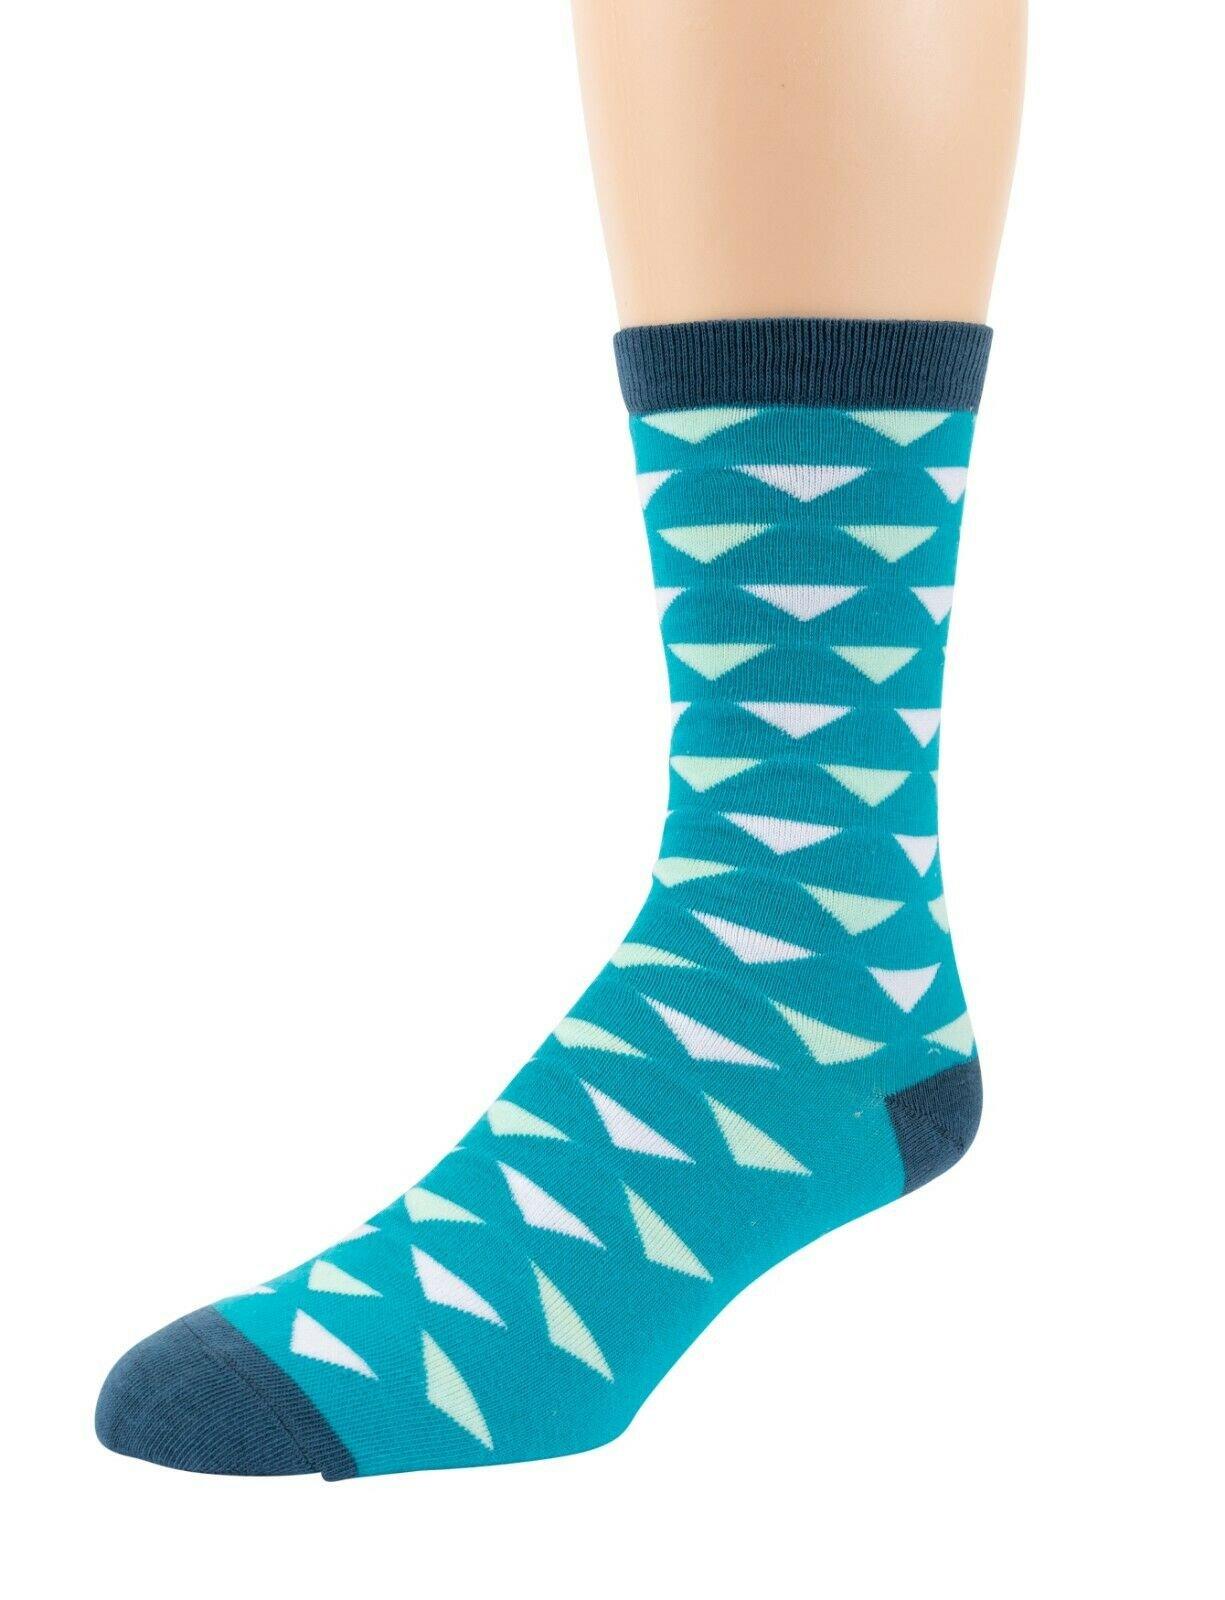 Mitch-Bogen-Mens-Cotton-Dress-Socks-Colorful-Fashion-Crew-Socks-8-Pack-Gift-Box thumbnail 46